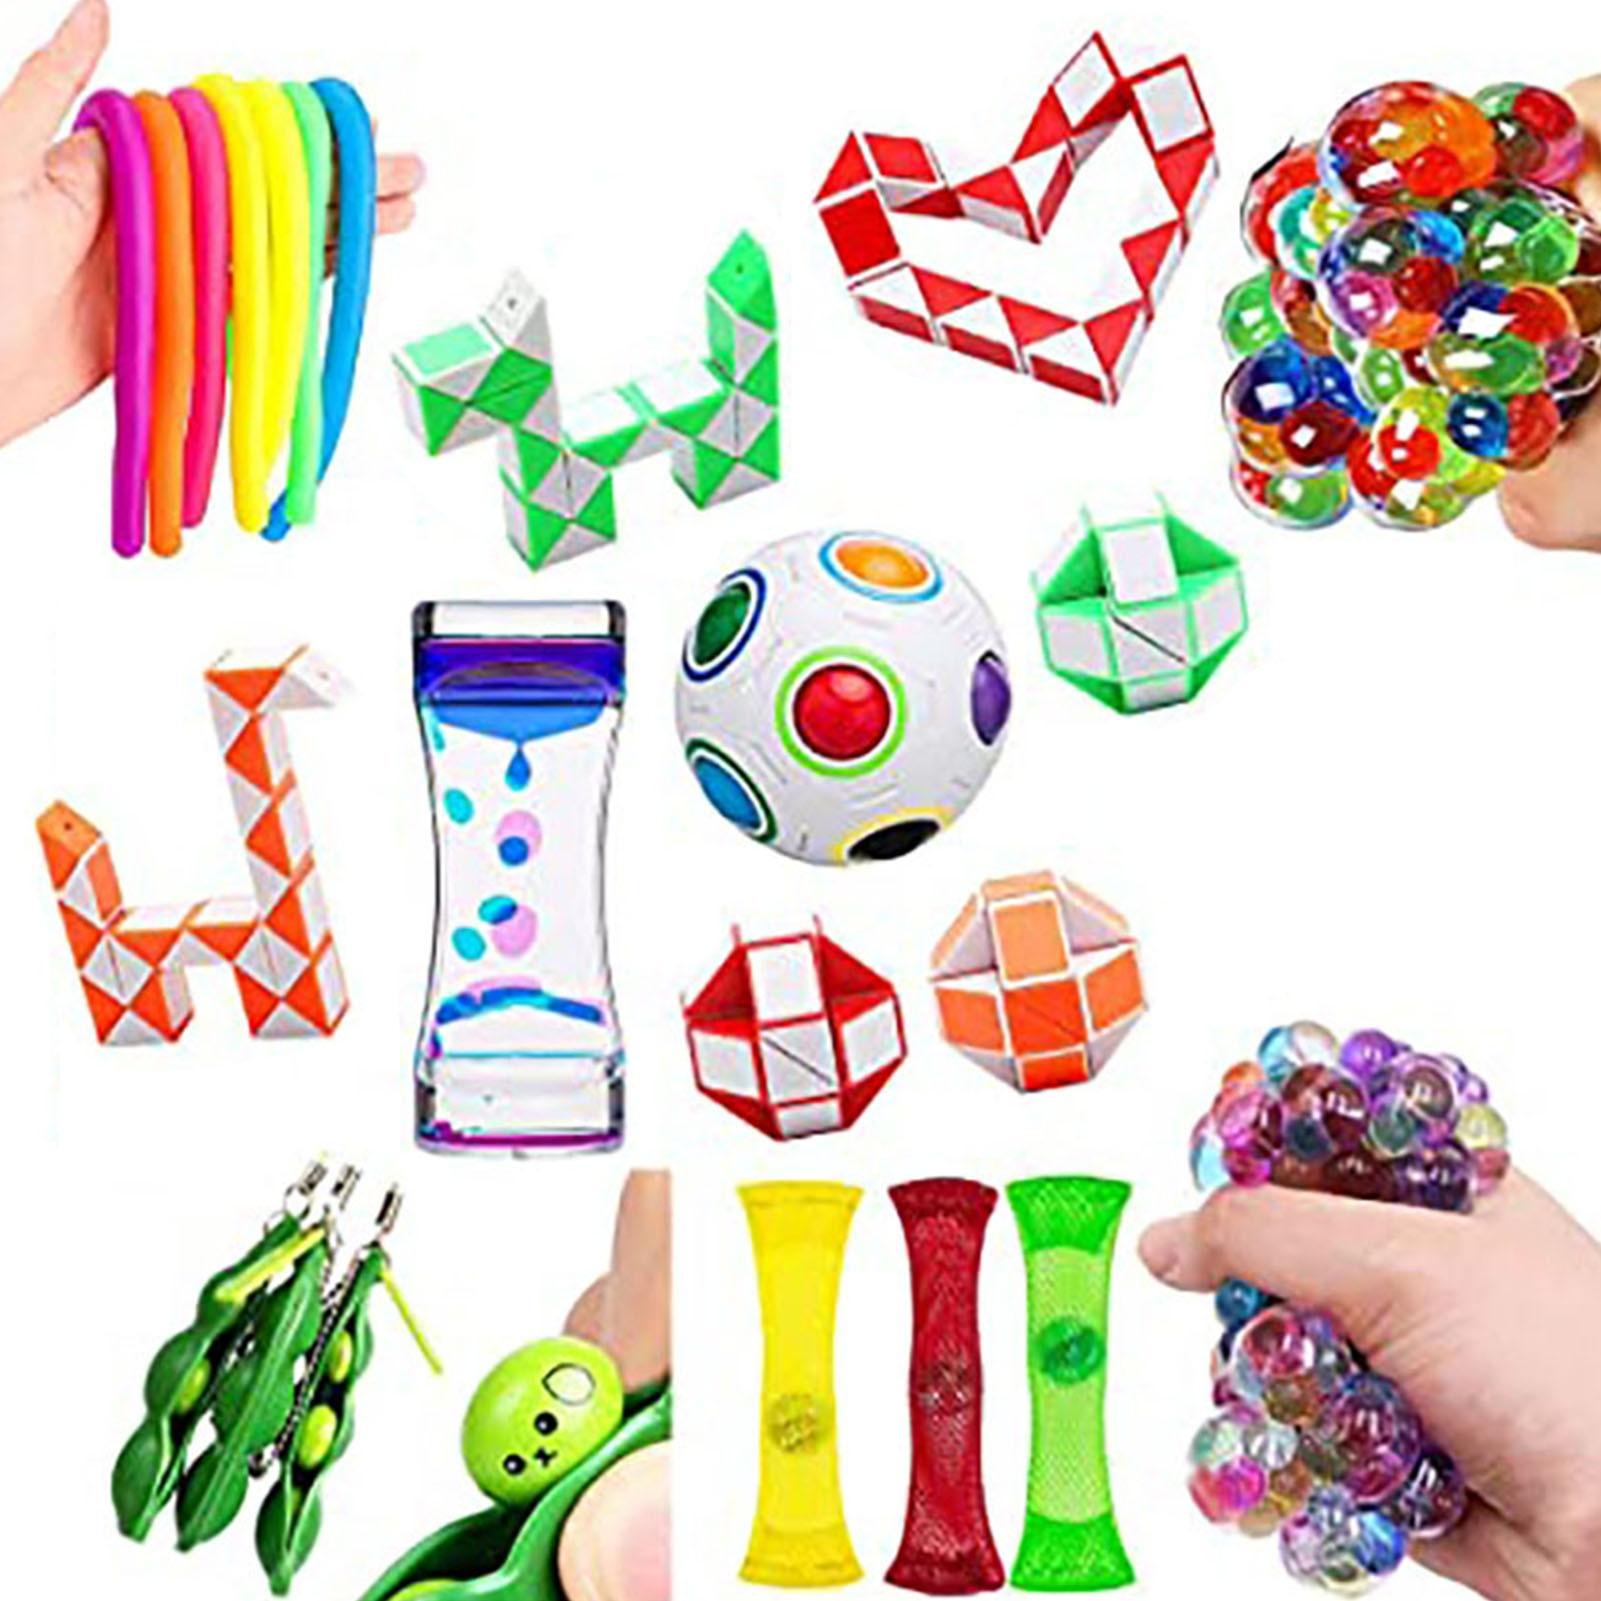 26 Styles Fidget Sensory Toy Set Stress Relief Toys Pop Bubble Stress Relief Squeeze Sensory Toys